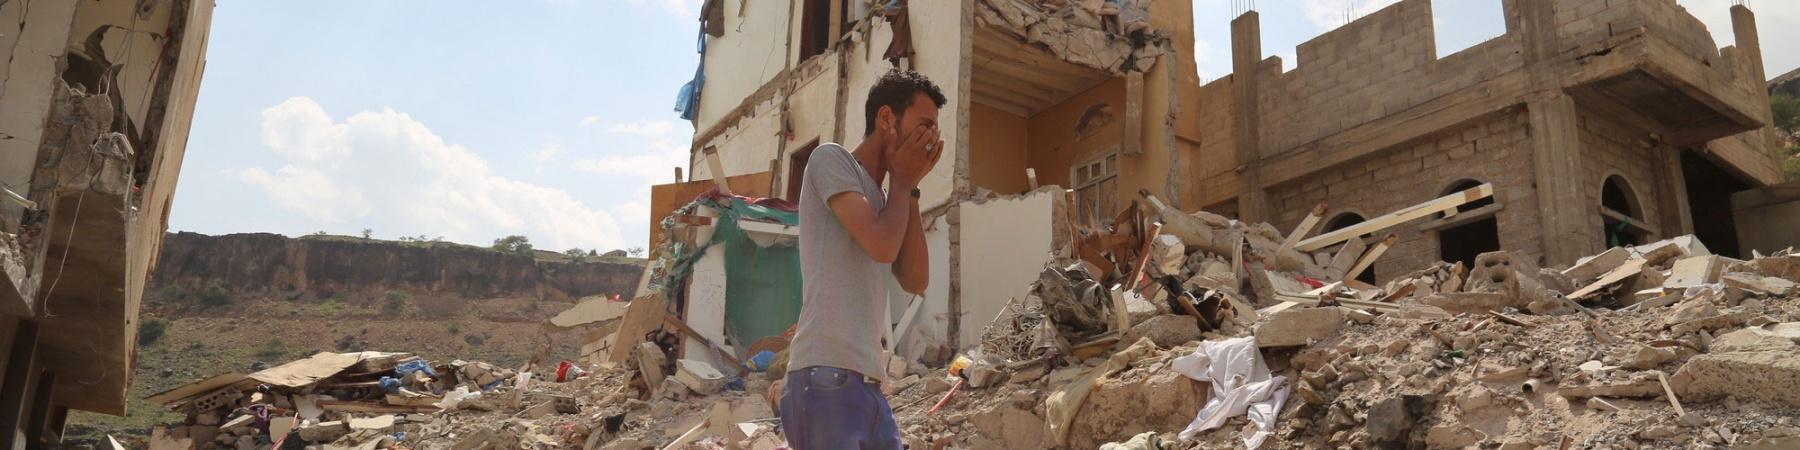 violenze in yemen